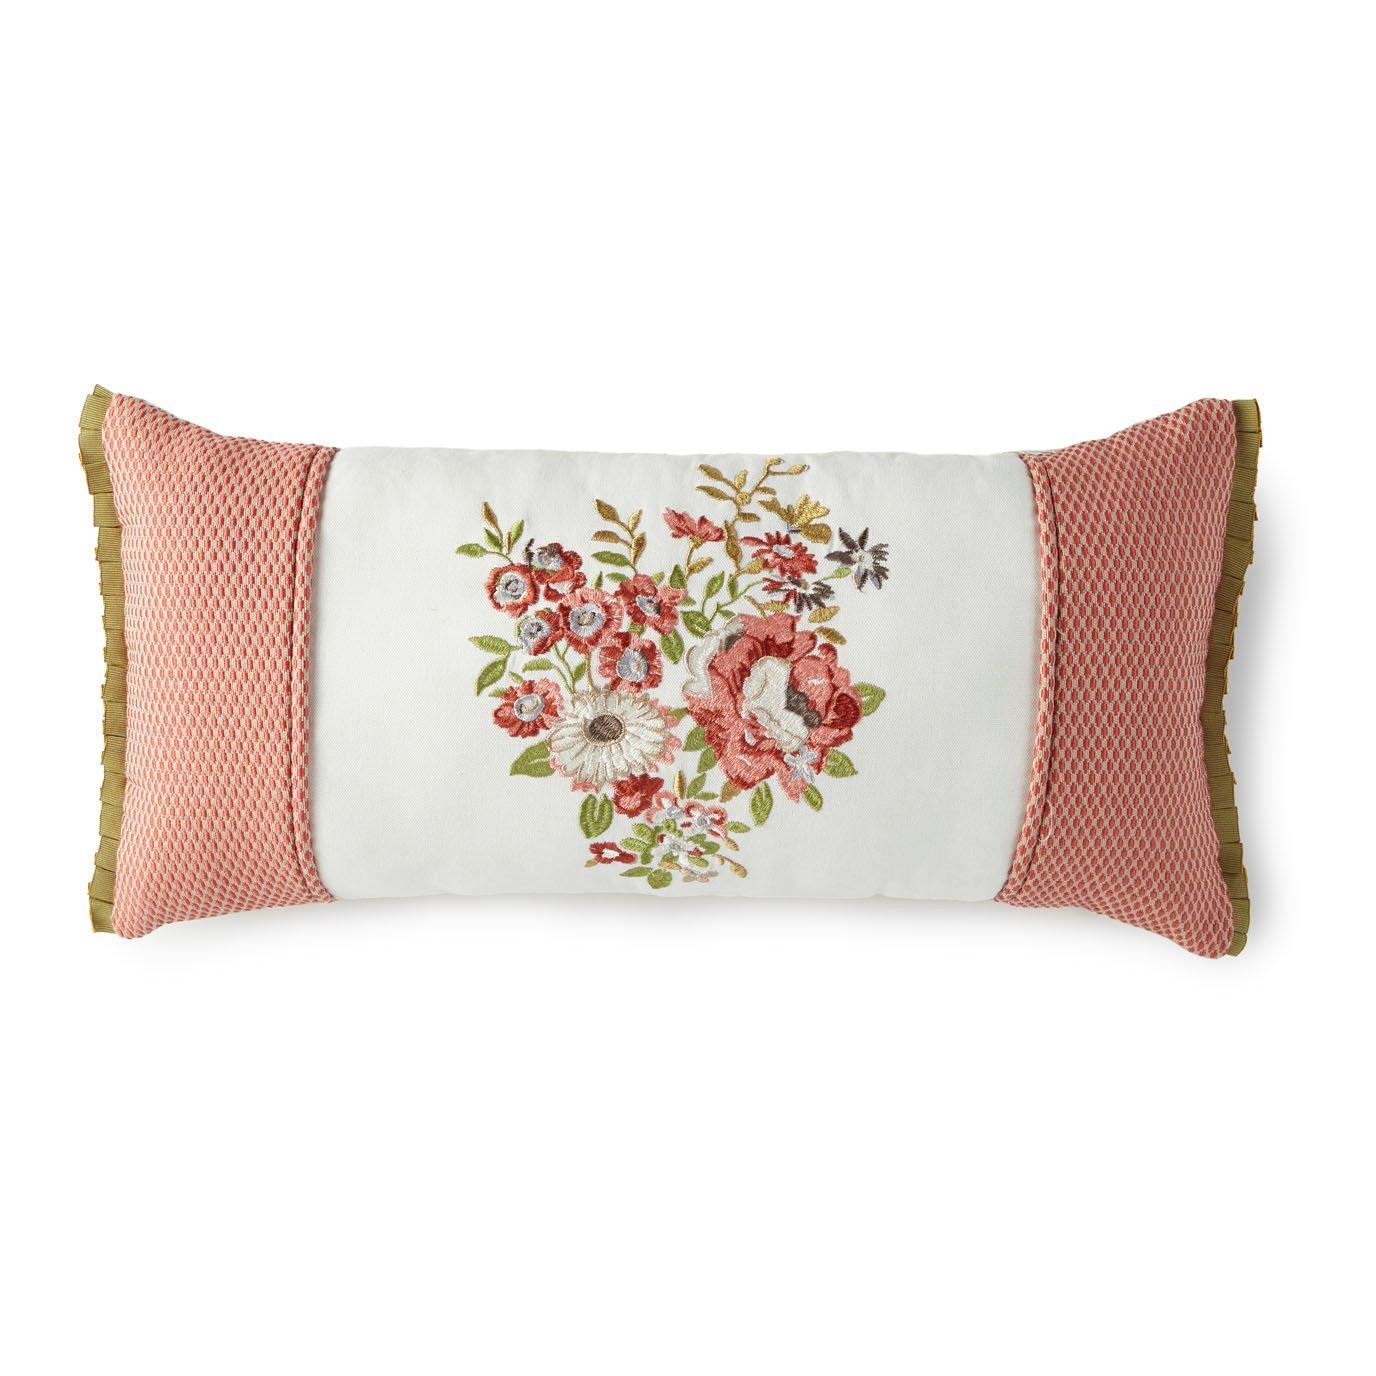 Lorraine 11X22 Pillow